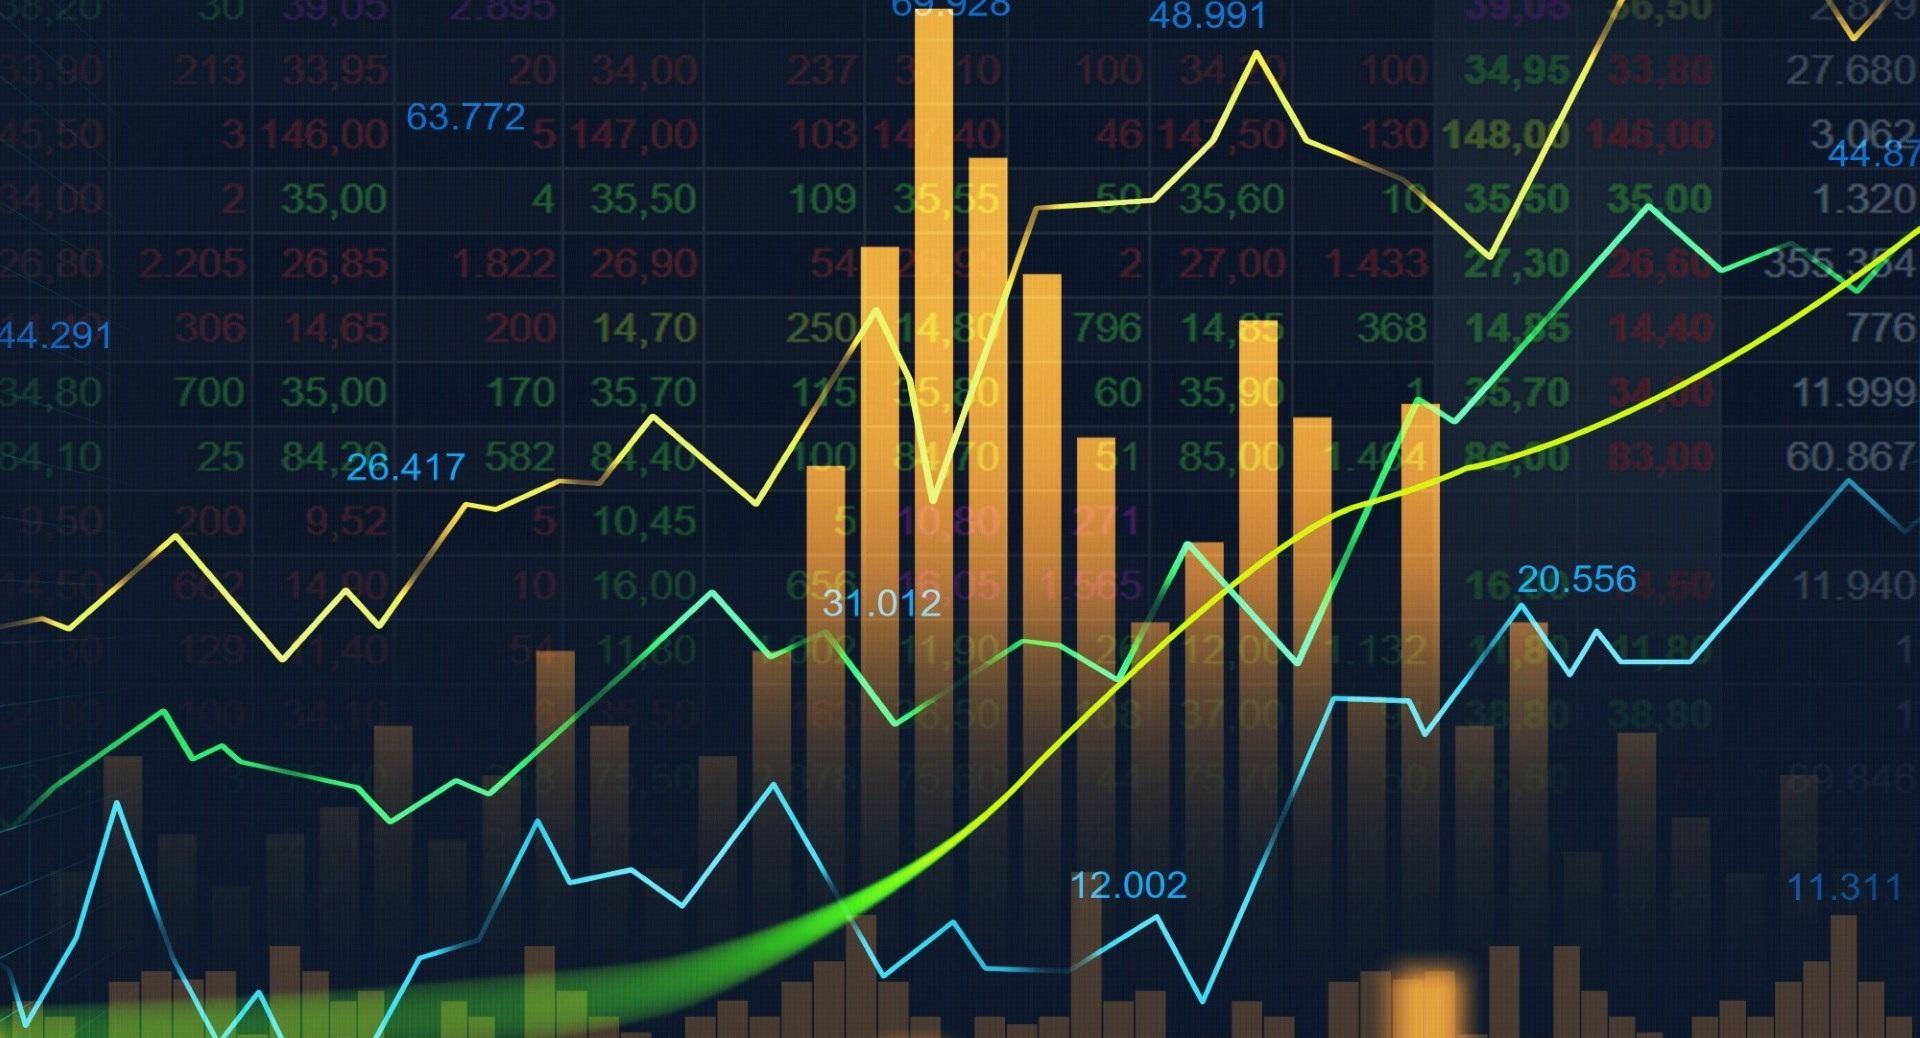 Trading performance analysis